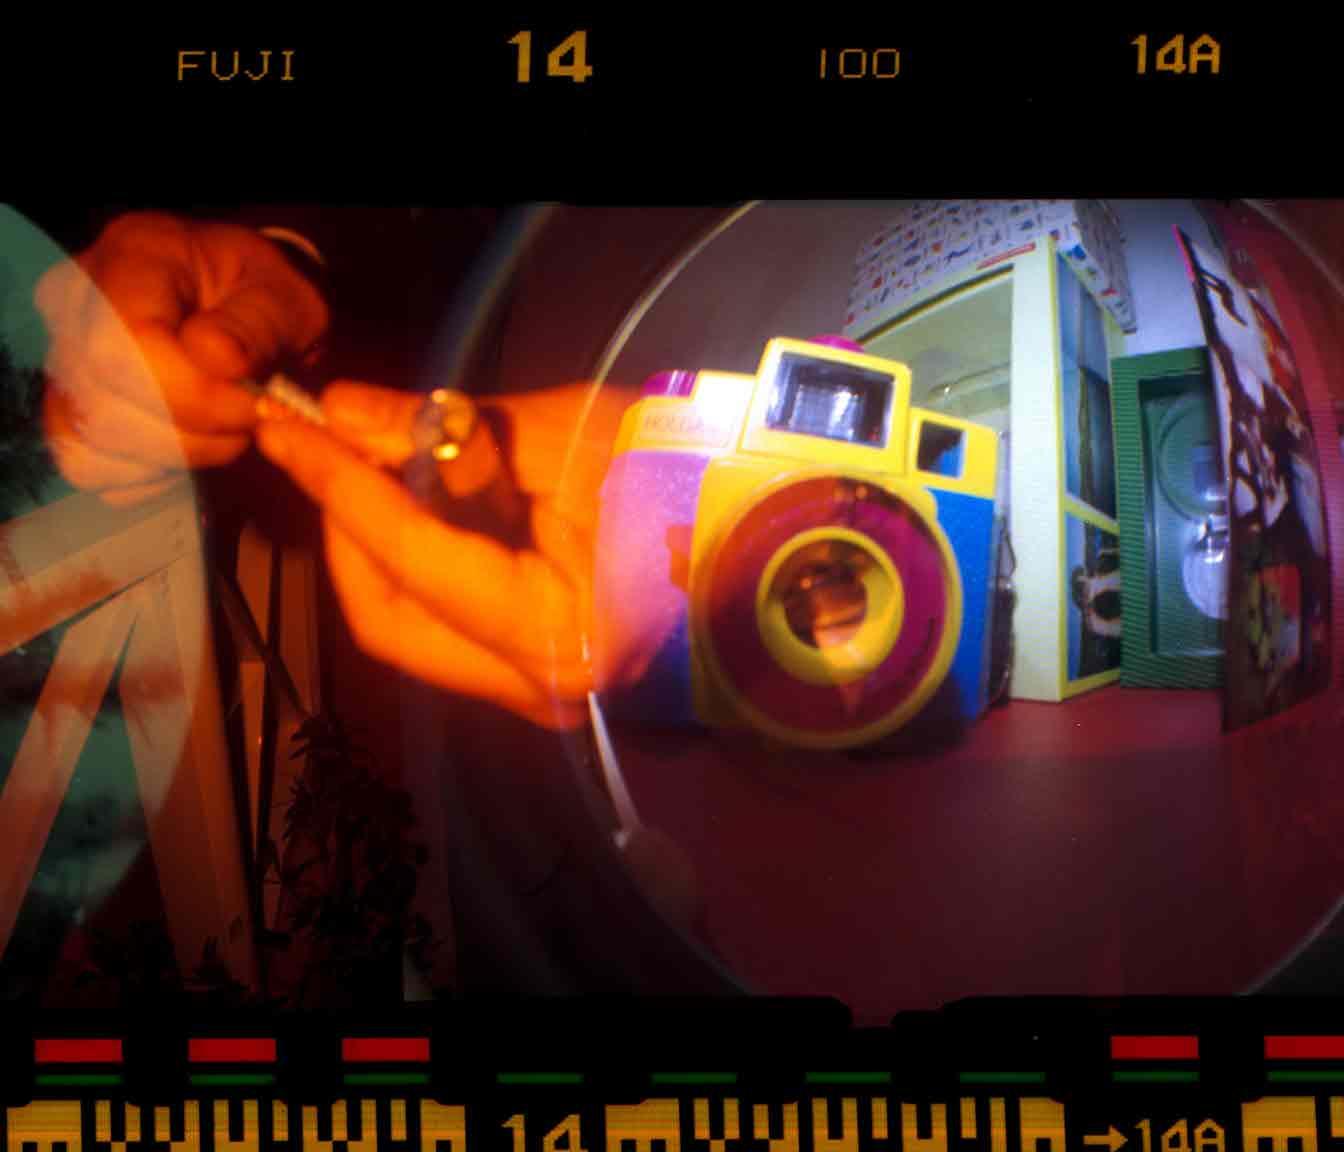 FilmSwap-fotografia-oldskull-04